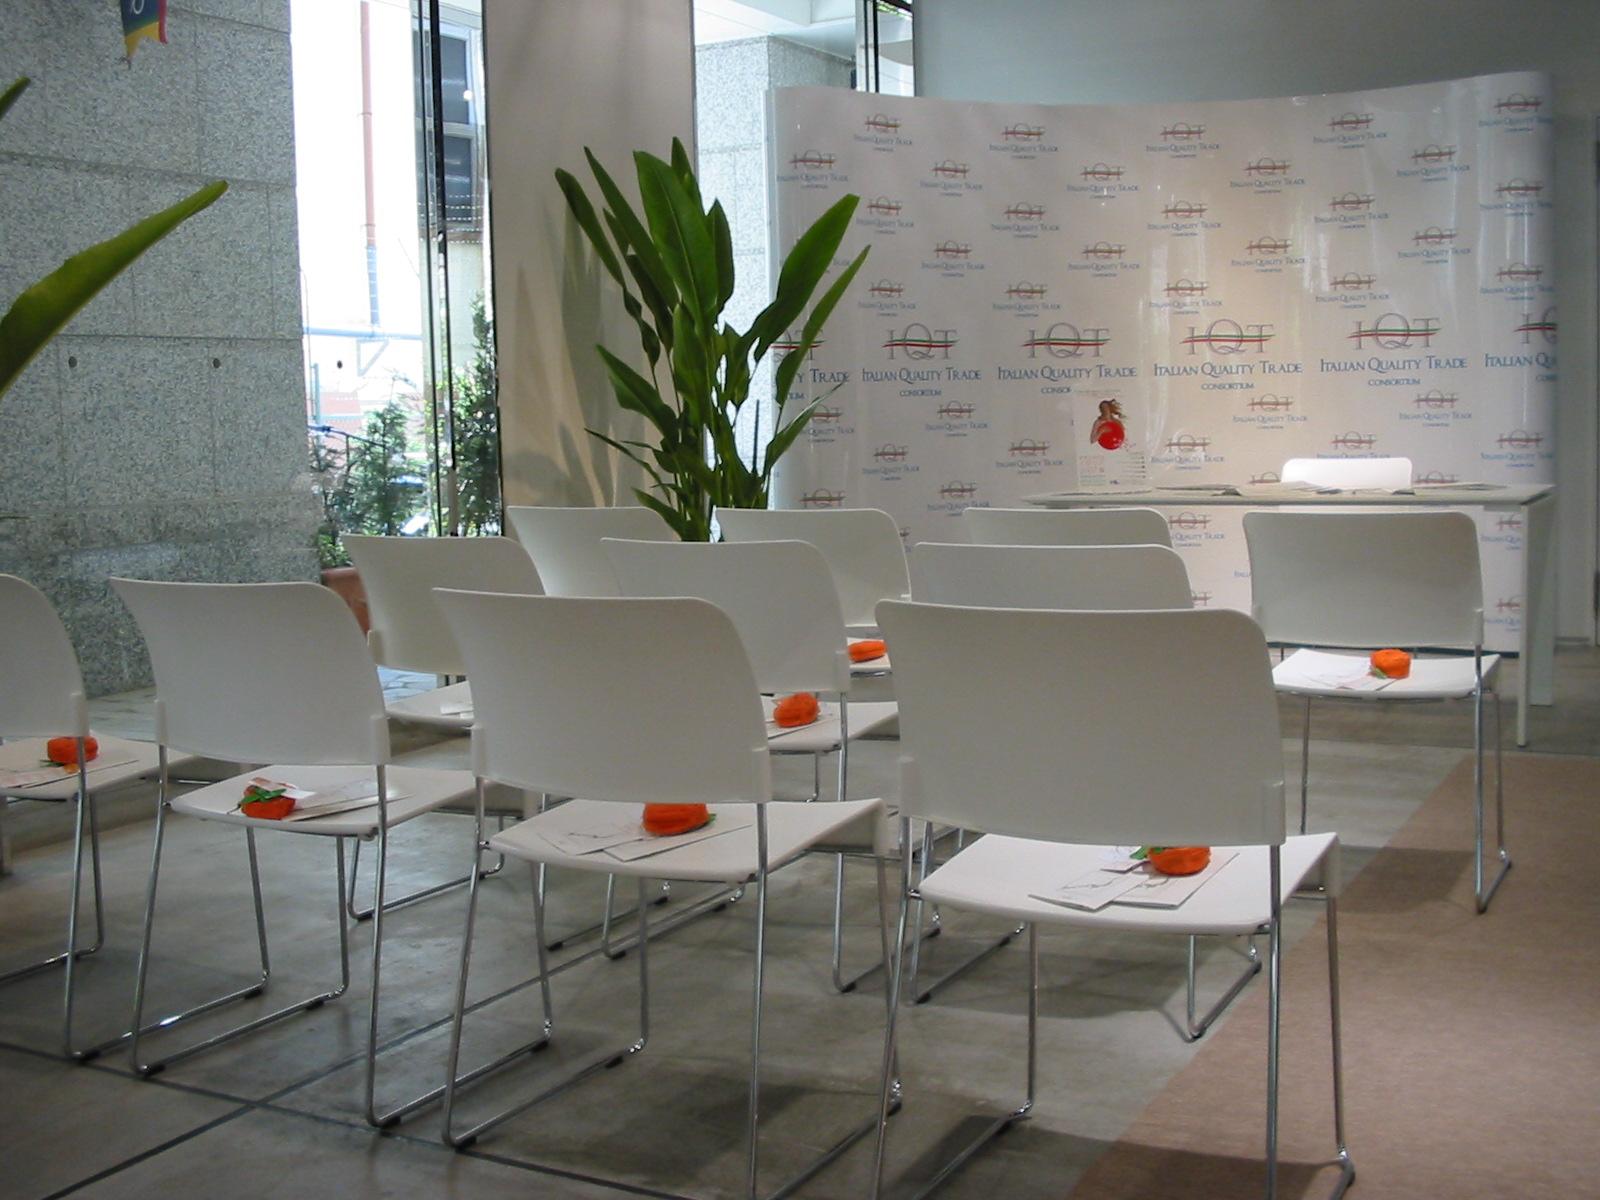 Tokyo - expo IQT 001